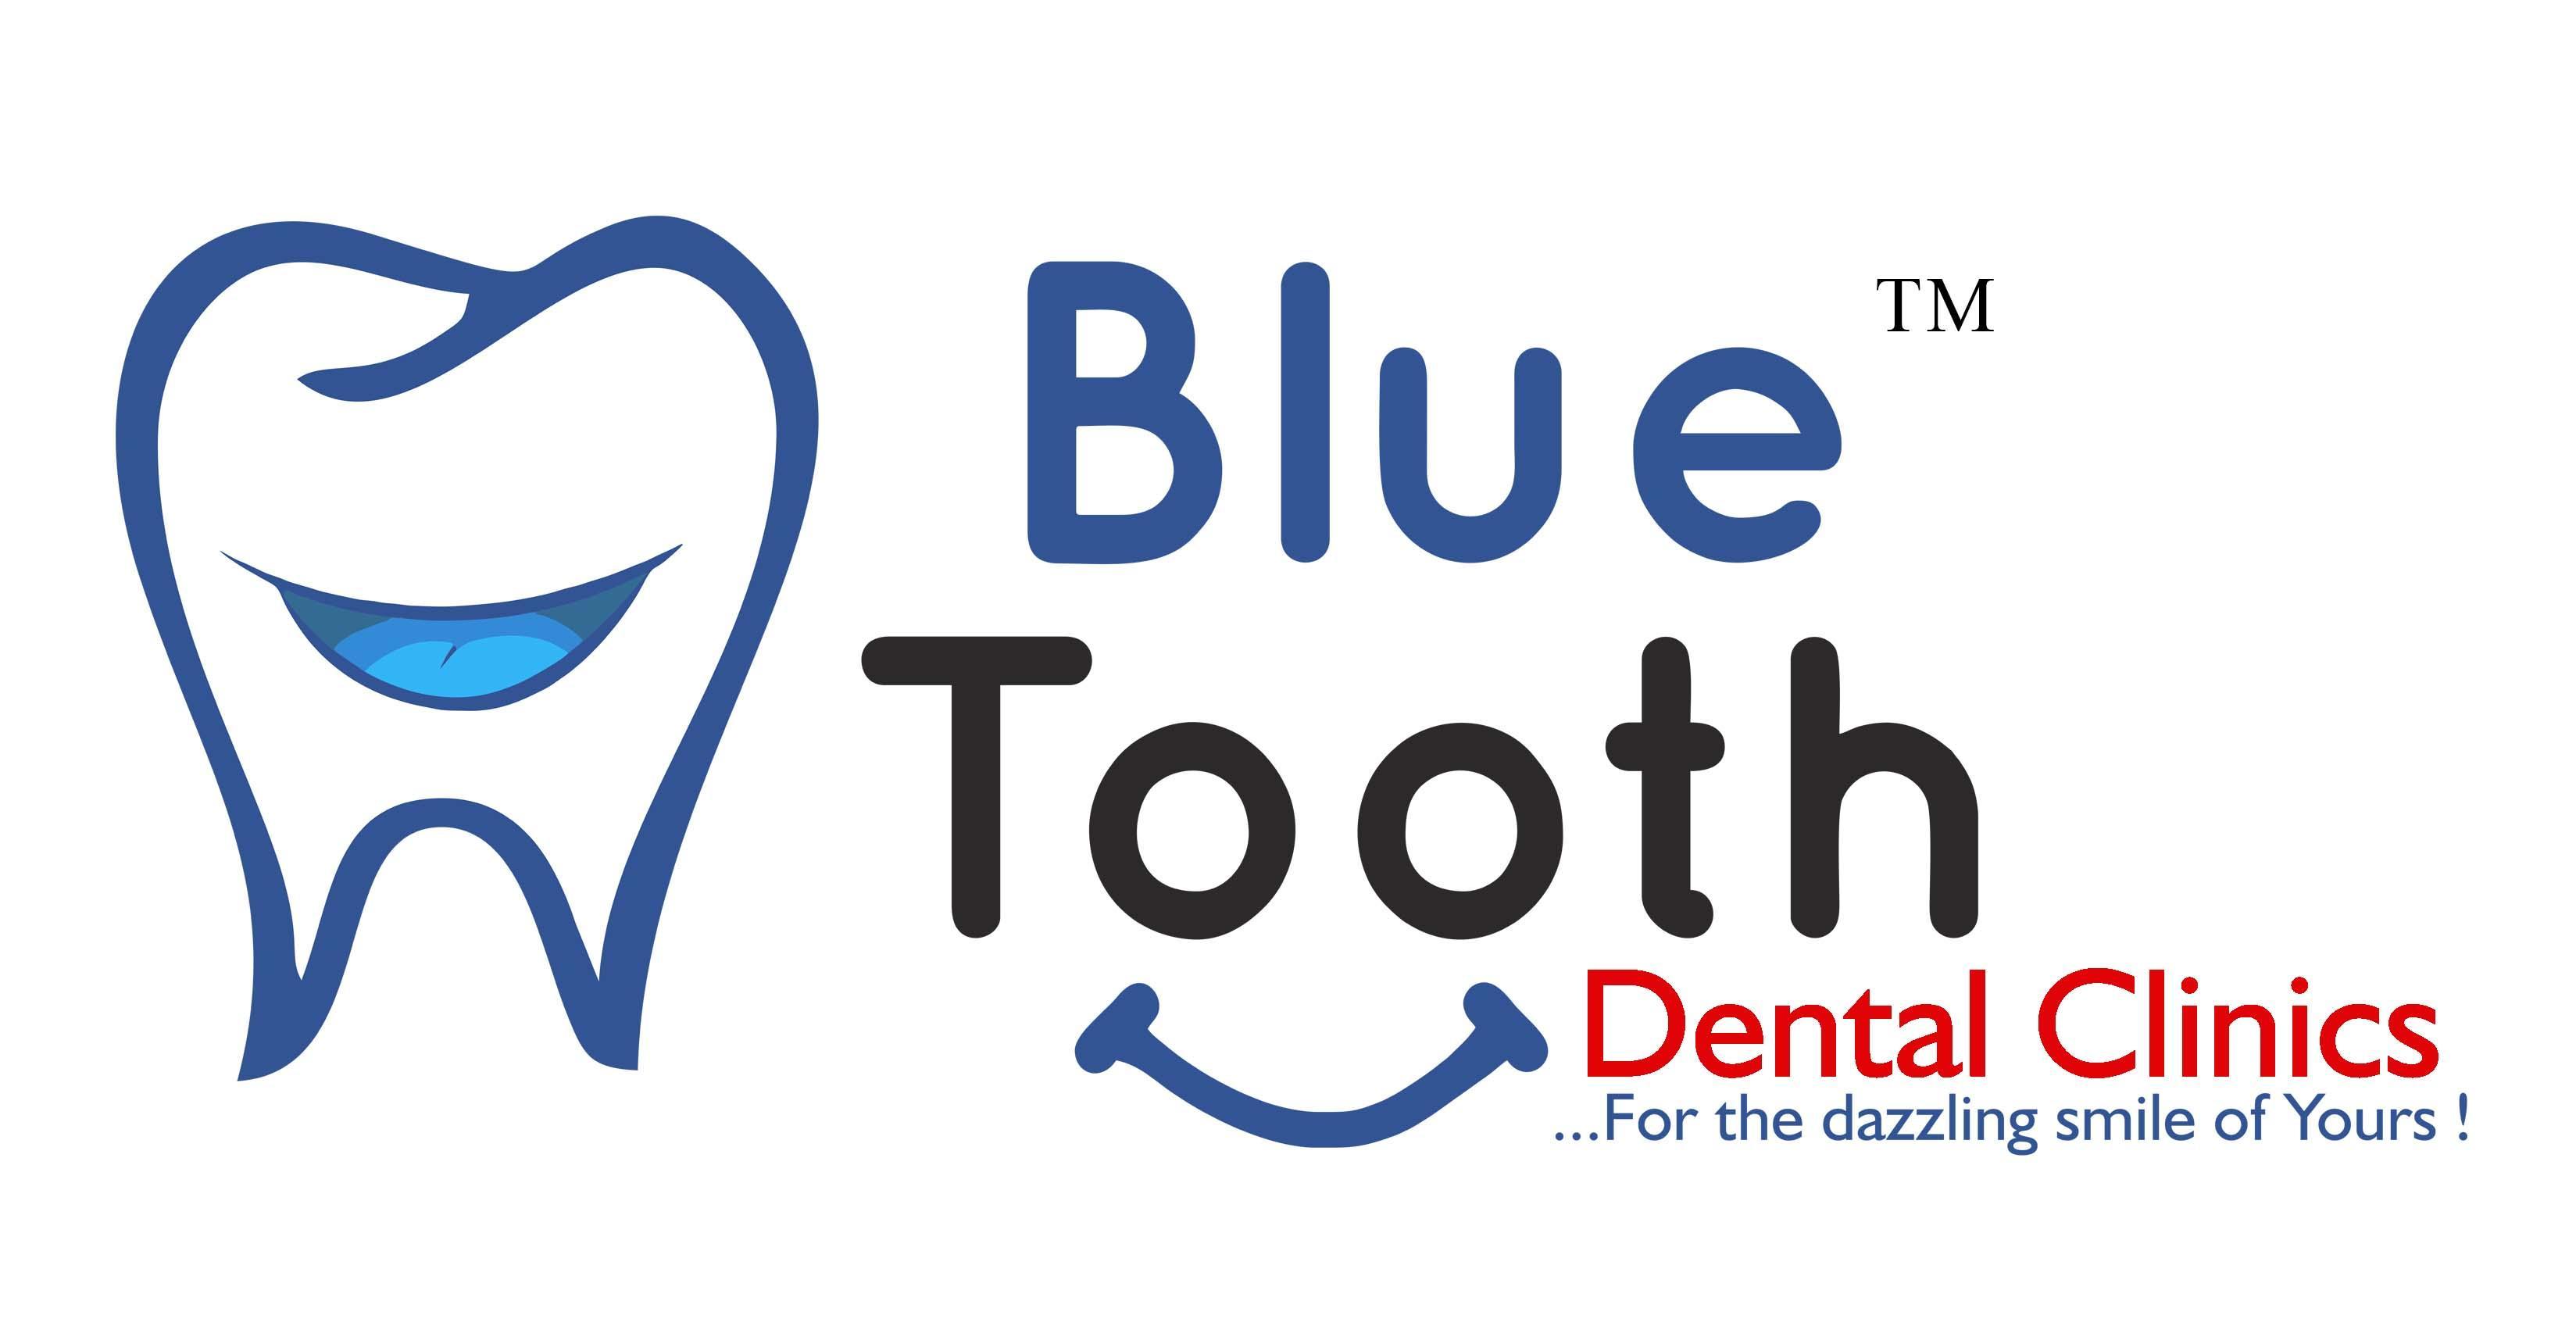 BlueTooth Dental Clinics